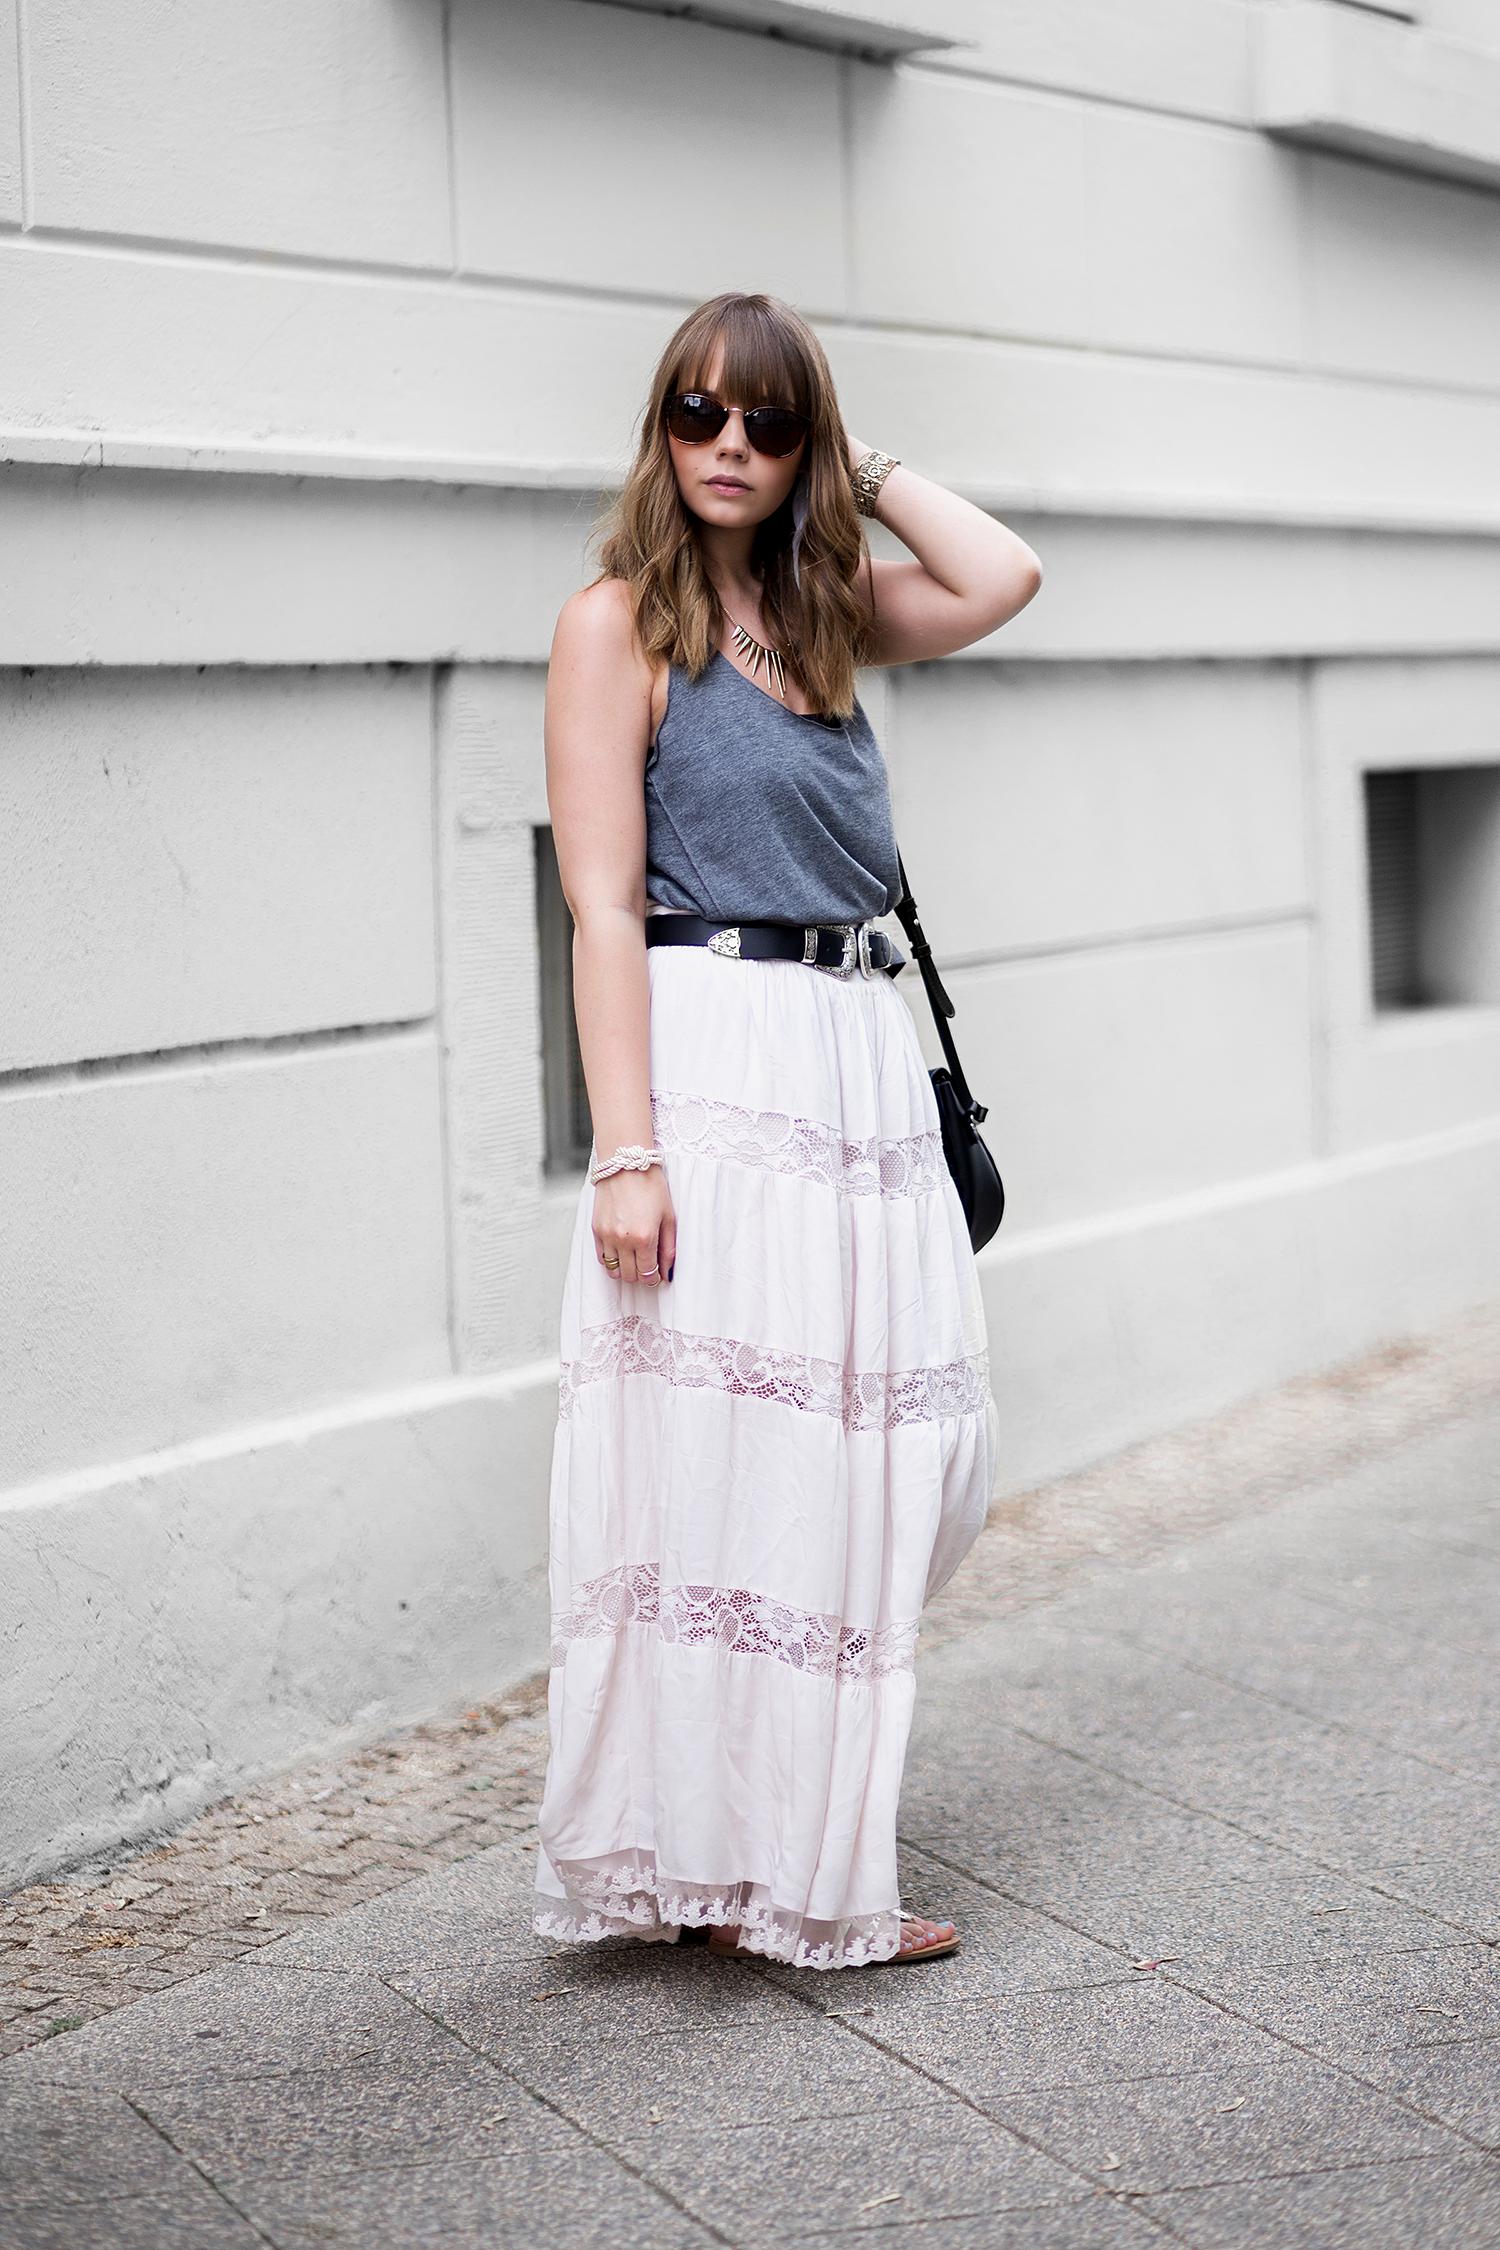 Boho Outfit, Rosa Maxirock mit Spitze, Hippie Style, 70s Outfit, bezauberndenana.de